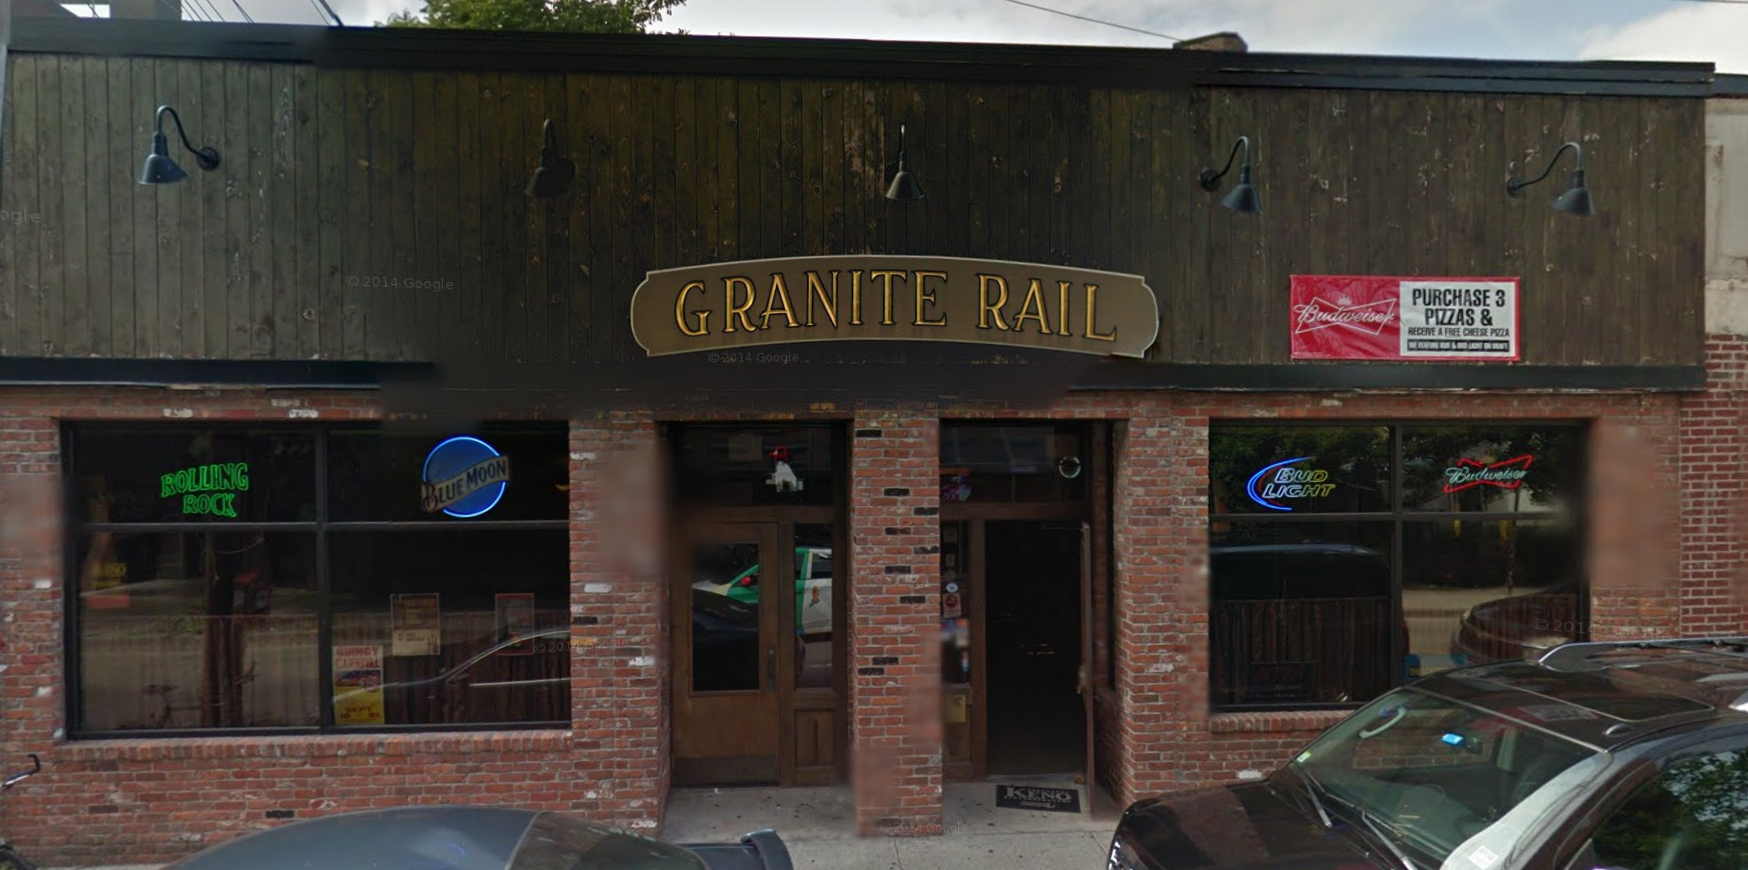 Granite Rail Tavern in Quincy